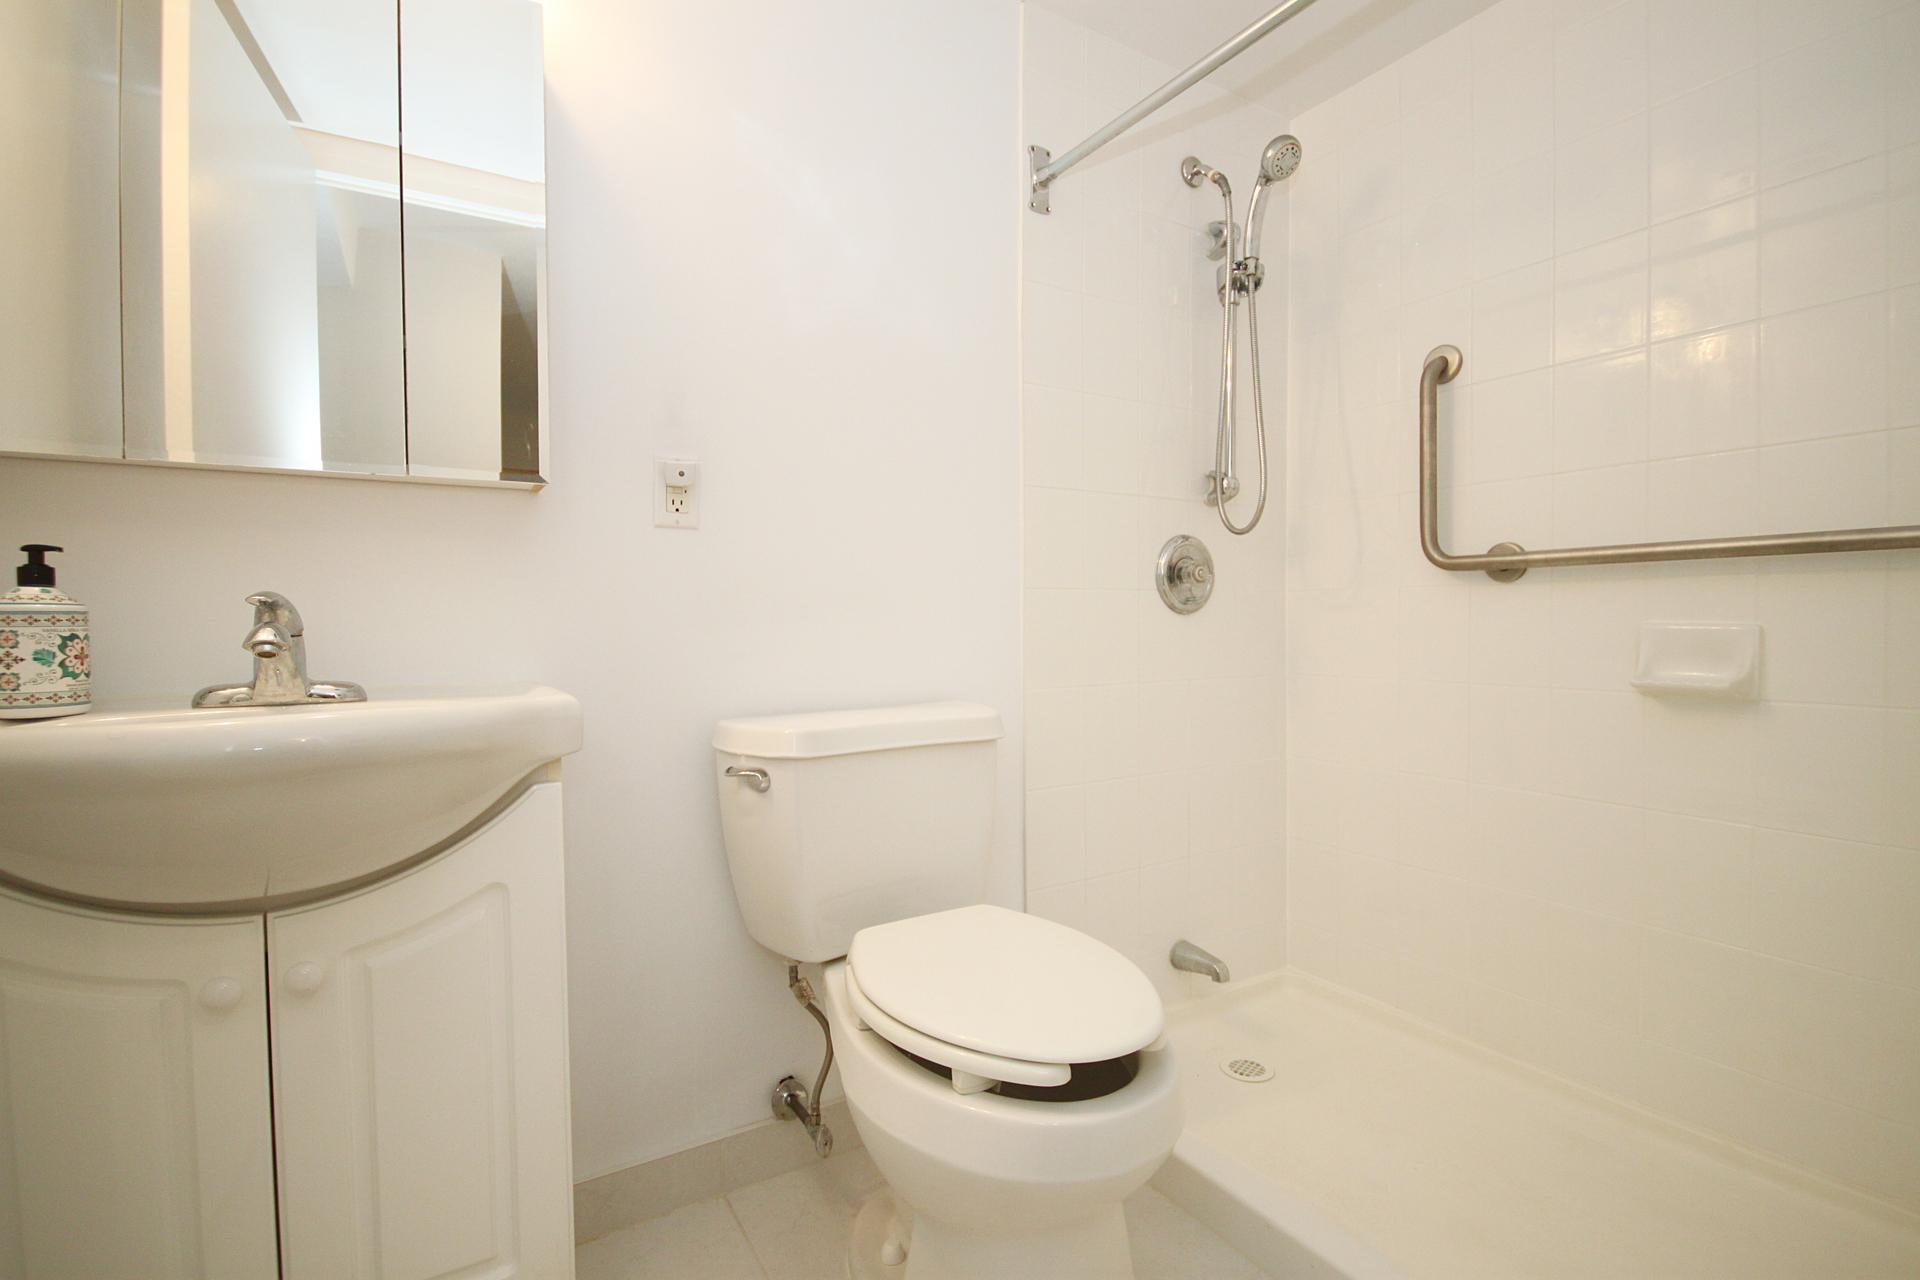 3 Piece Bathroom at 1704 - 1350 York Mills Road, Parkwoods-Donalda, Toronto